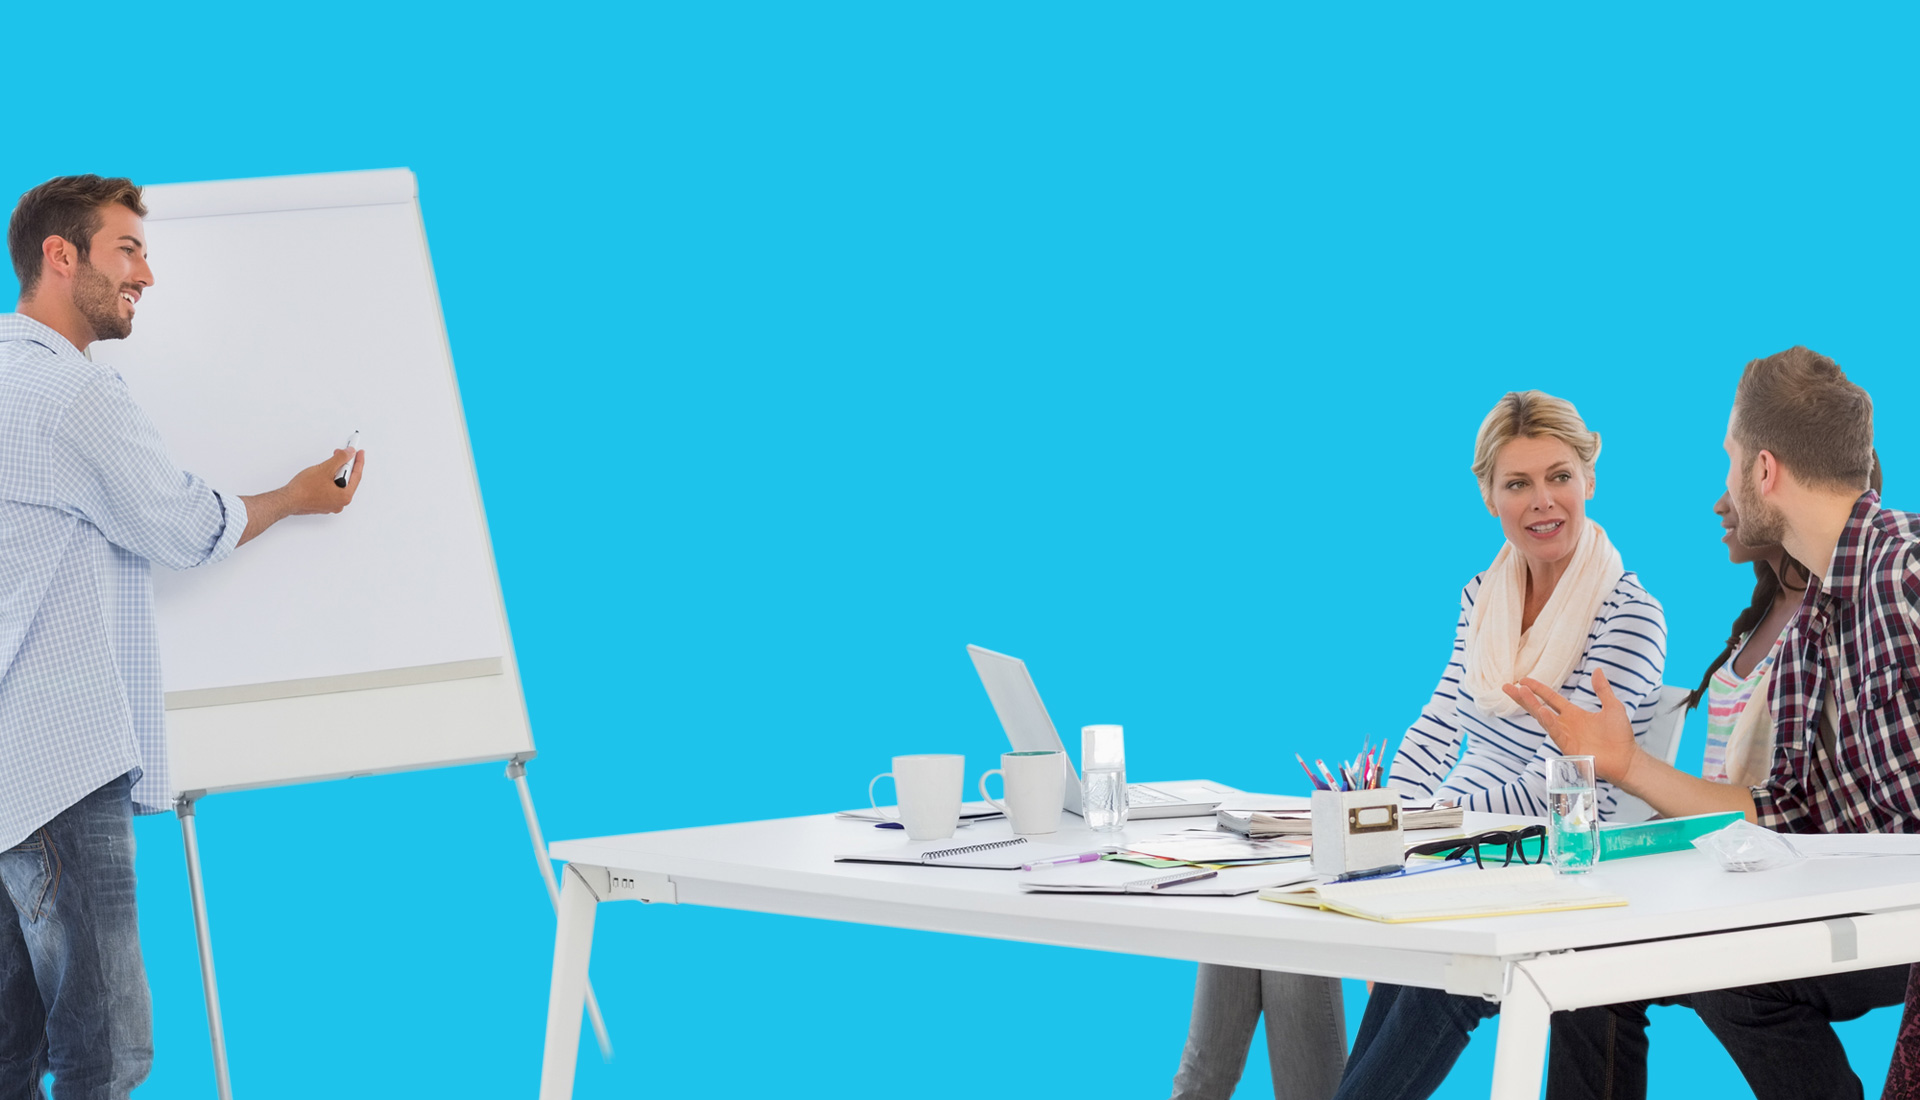 Orientación Profesional para tu Proyecto de Grado